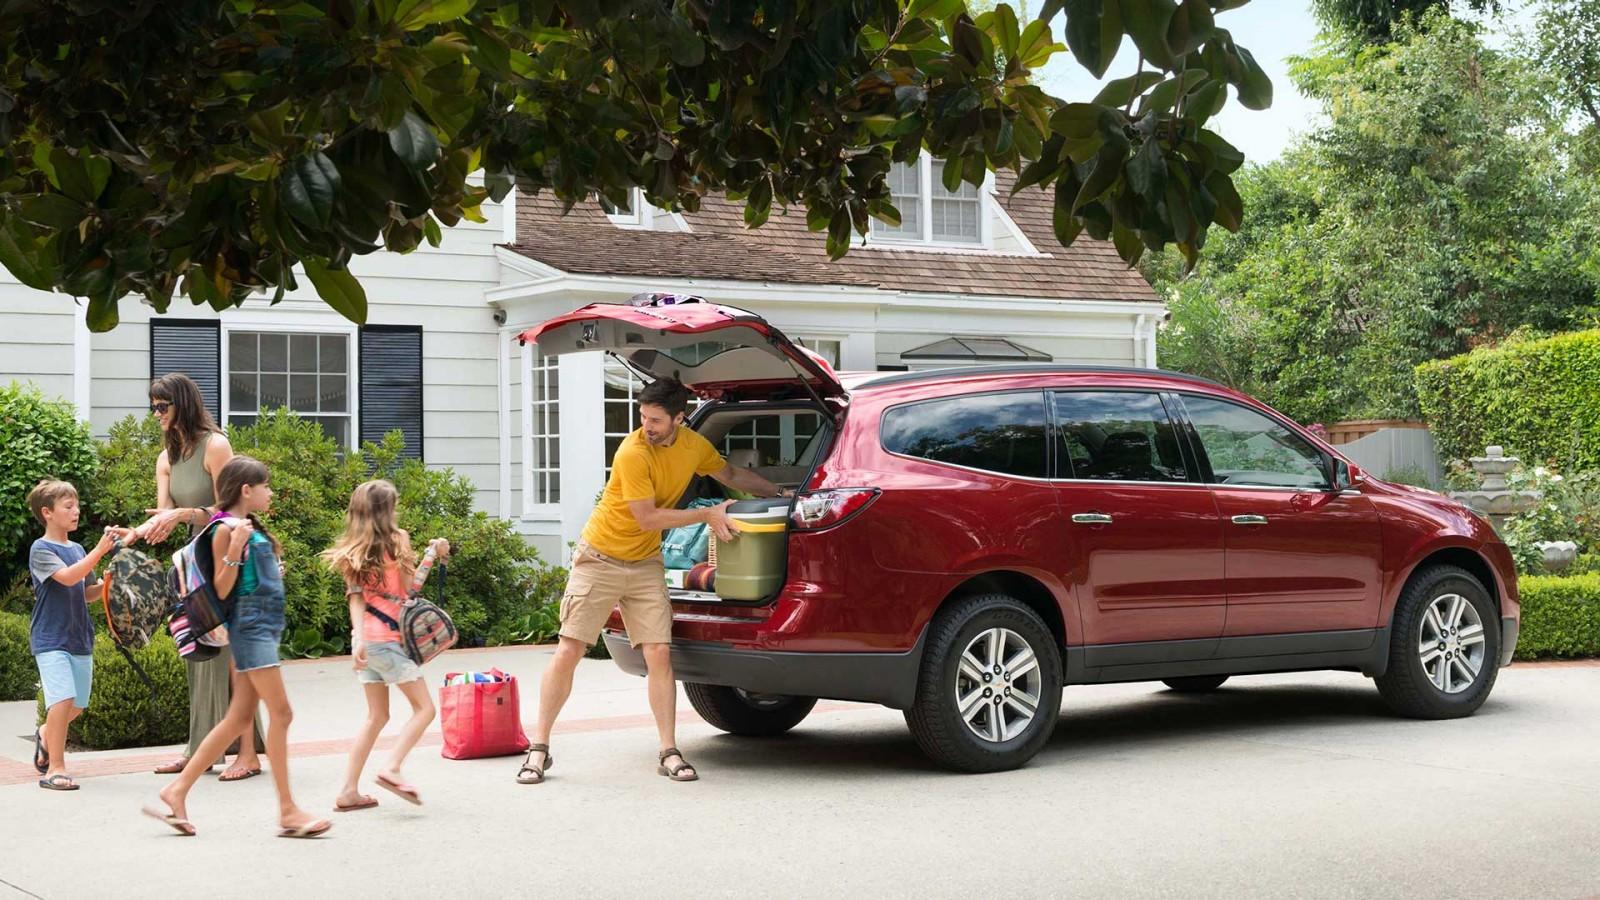 New Chevrolet Traverse Exterior image 1